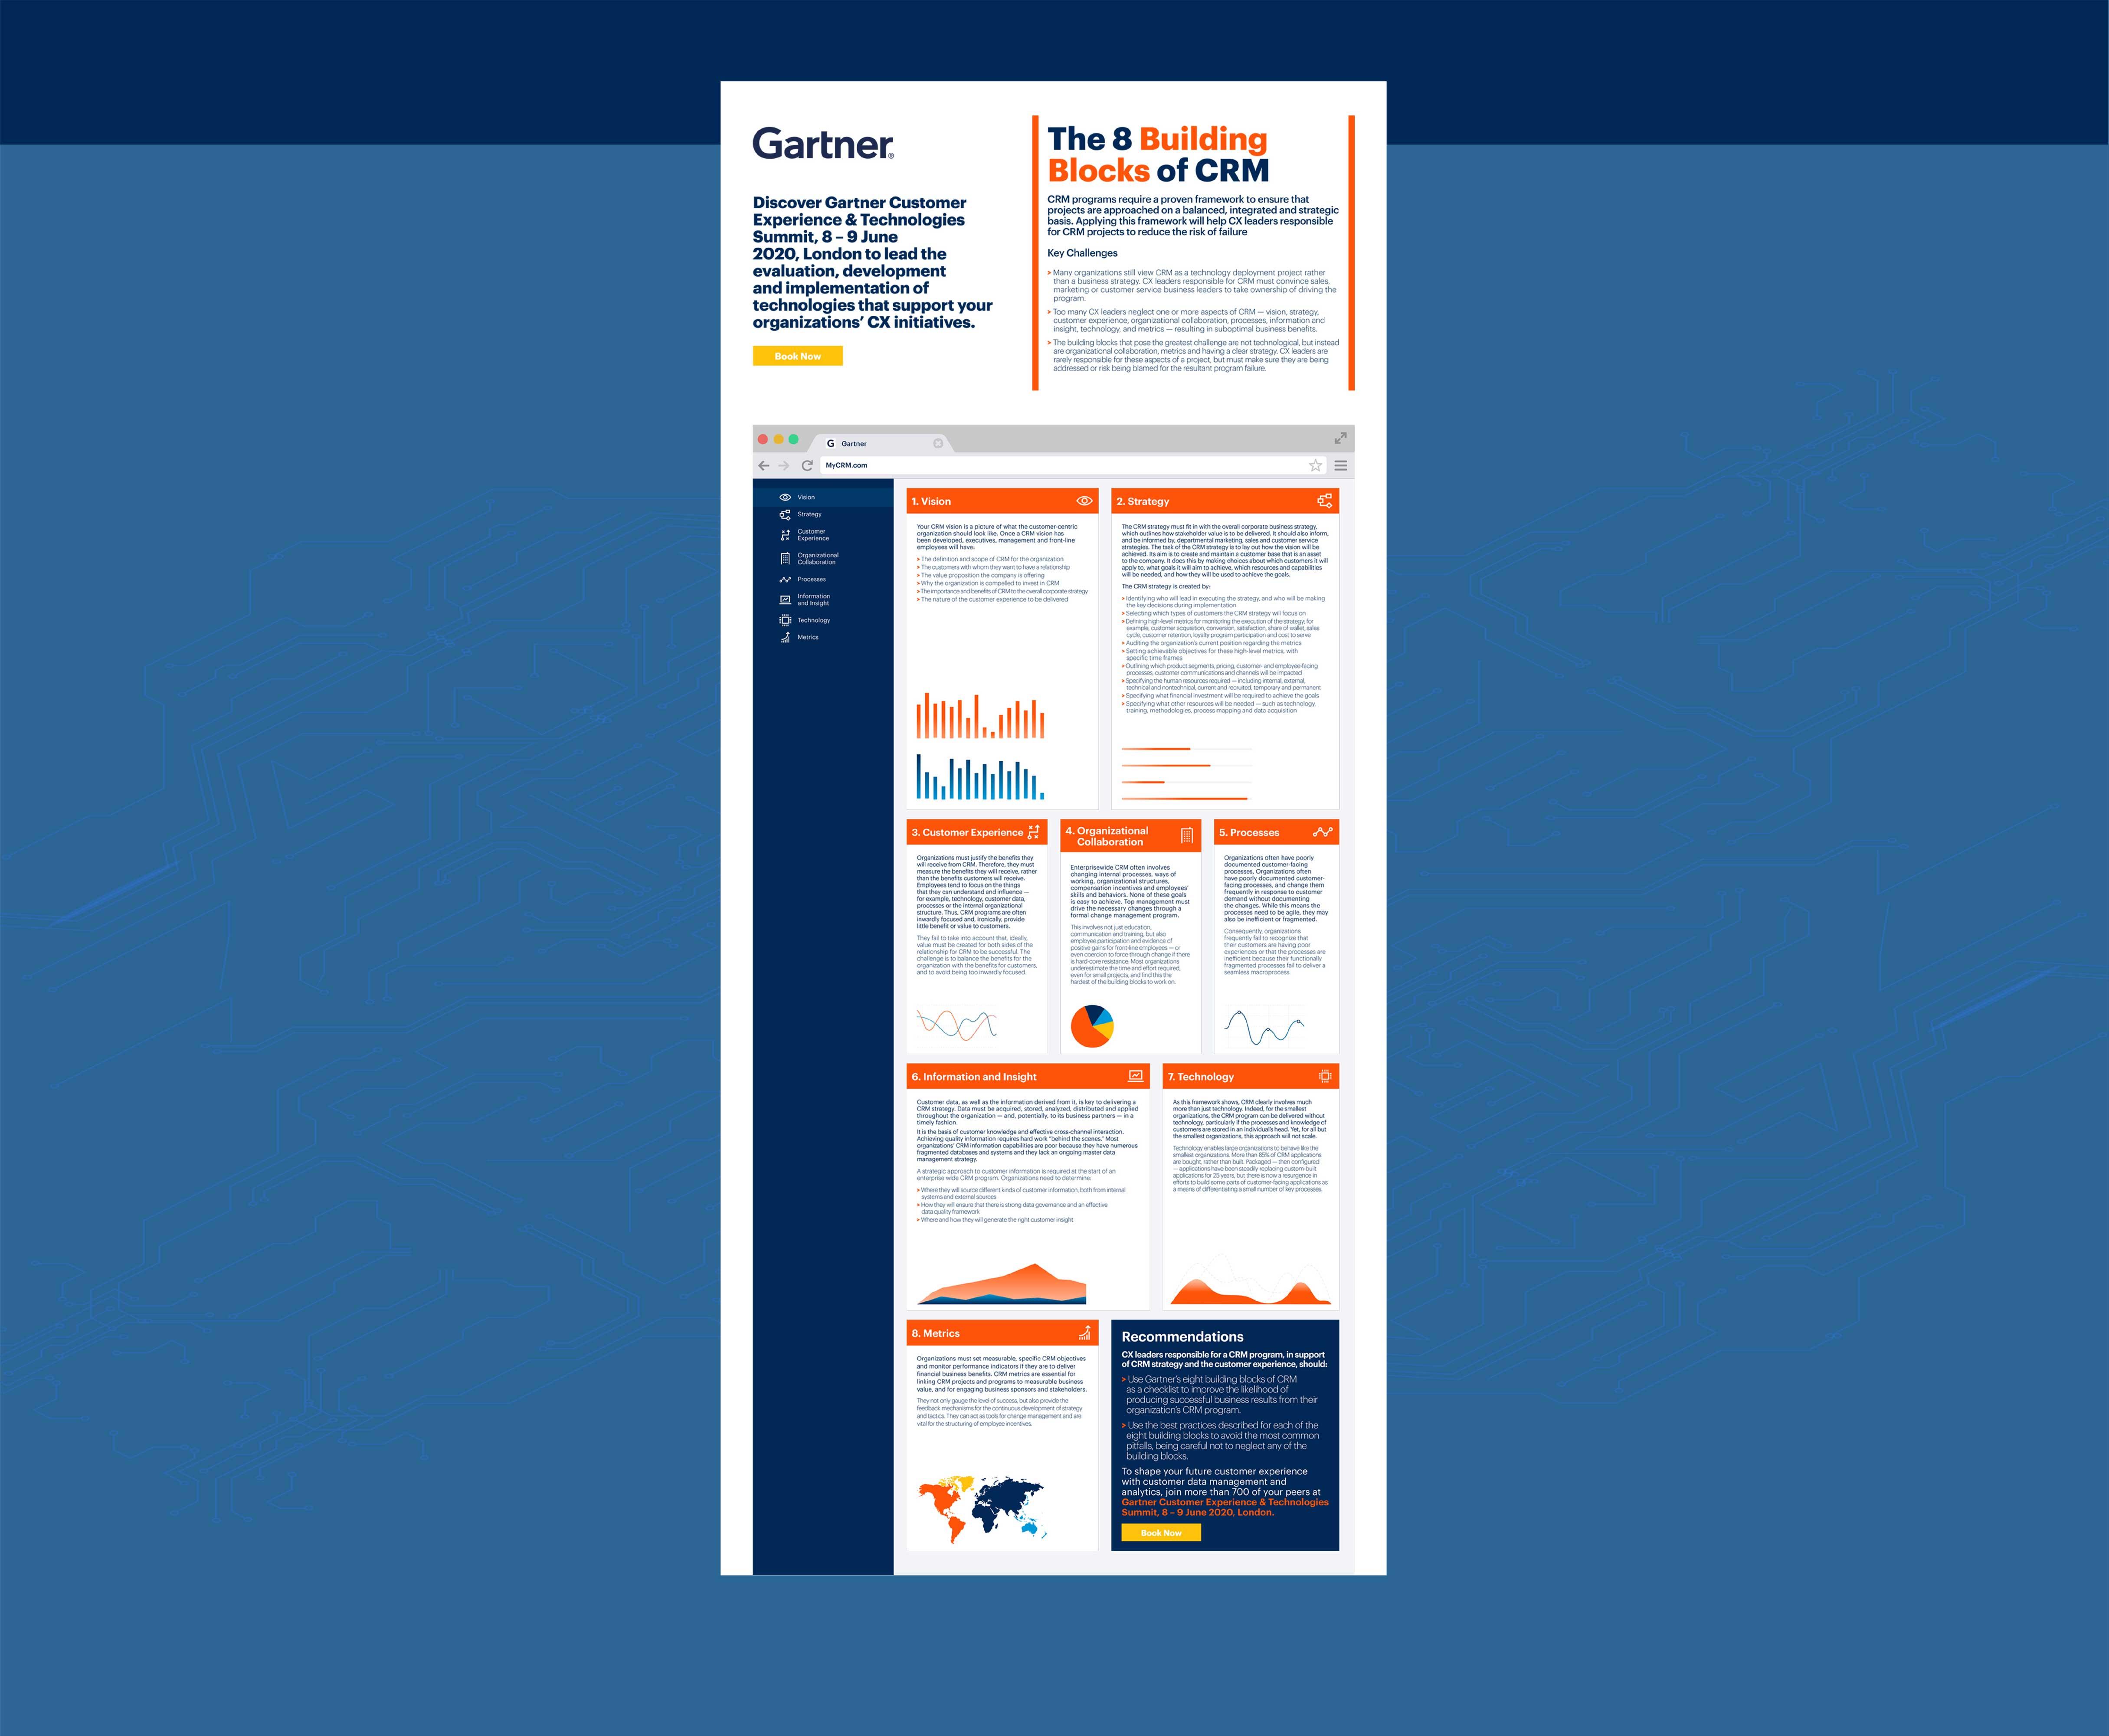 Gartner webpage